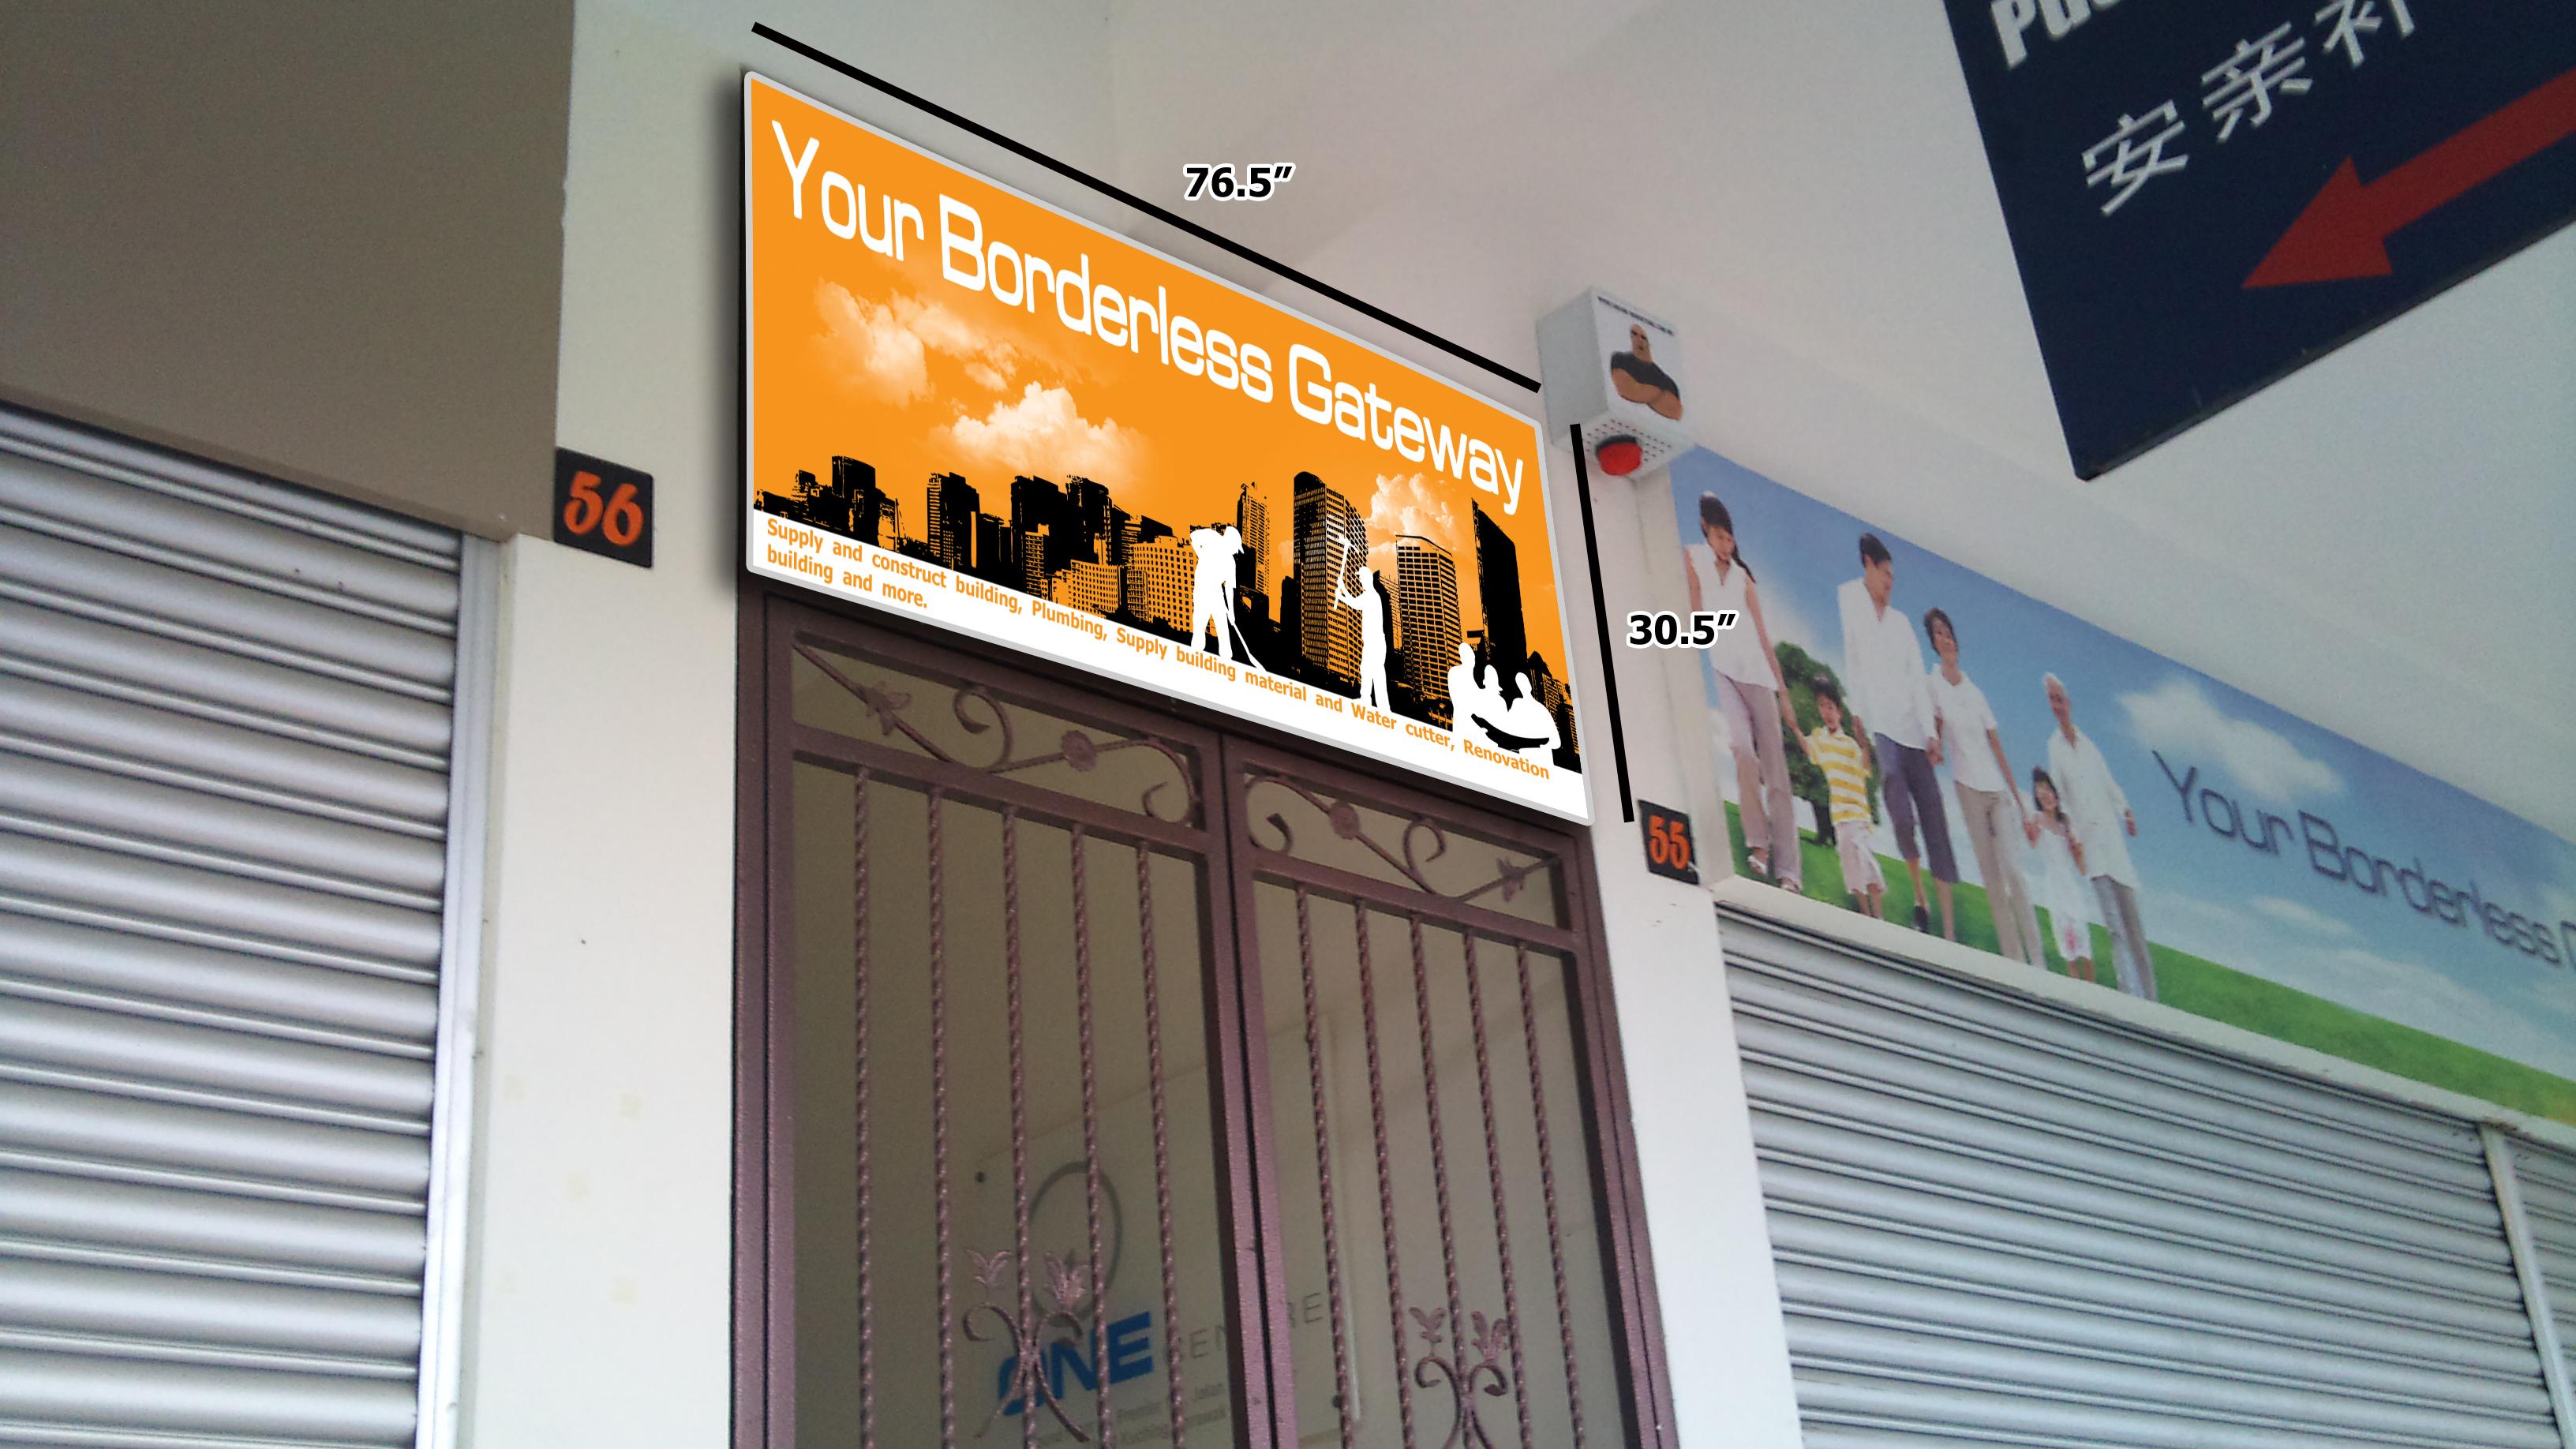 The Borderless Gateway